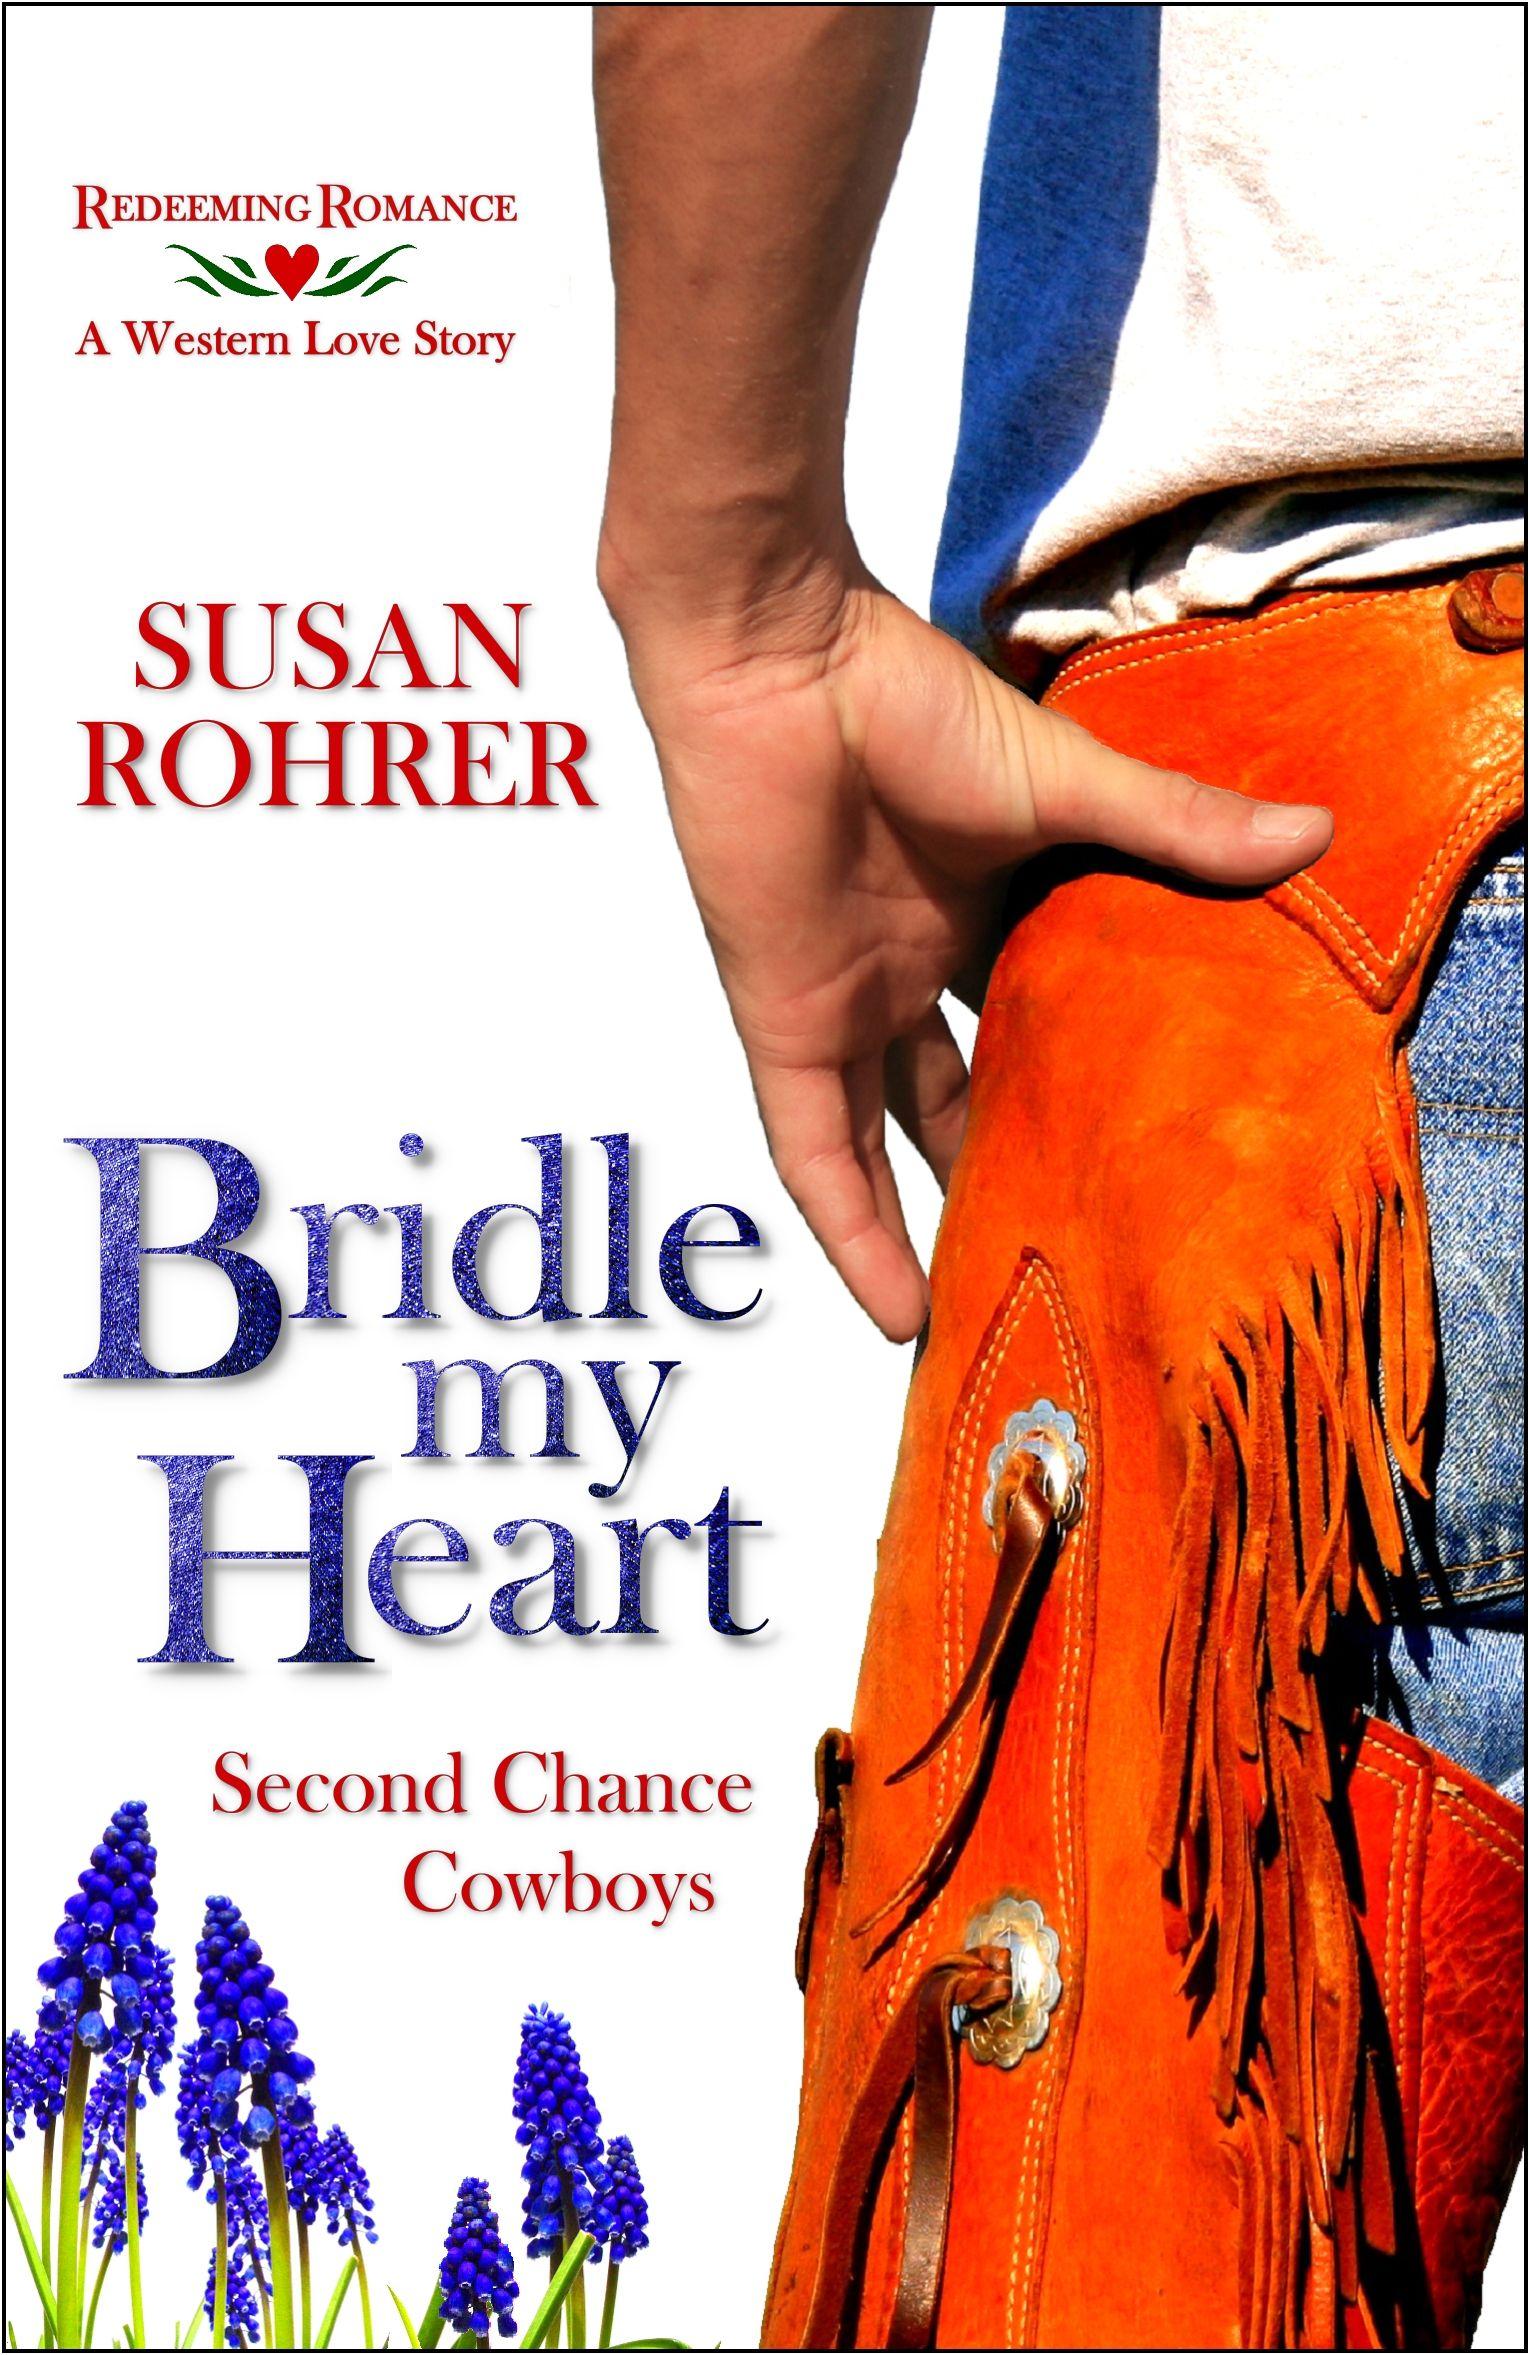 Bridle my heart a western love story redeeming romance by susan bridle my heart a western love story redeeming romance by susan rohrer http fandeluxe Gallery